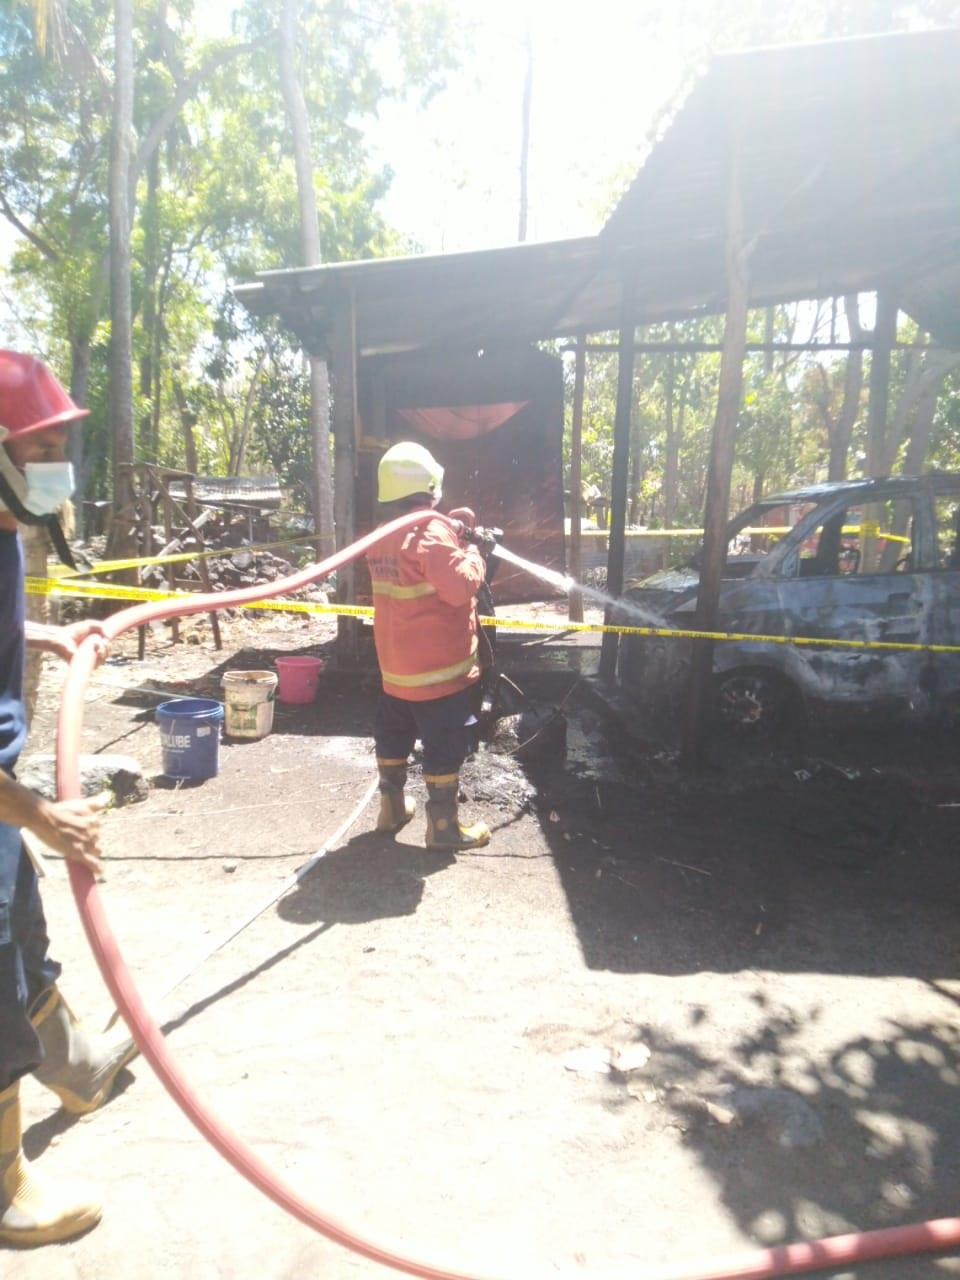 MOBIL Suzuki APV DK 1985 AAB yang diparkir di garasi Made Putu Sarjana di Banjar Dinas Lebah, Desa Sukadana, Kubu, Karangasem hangus terbakar, Rabu (11/8/2021). Foto: ist